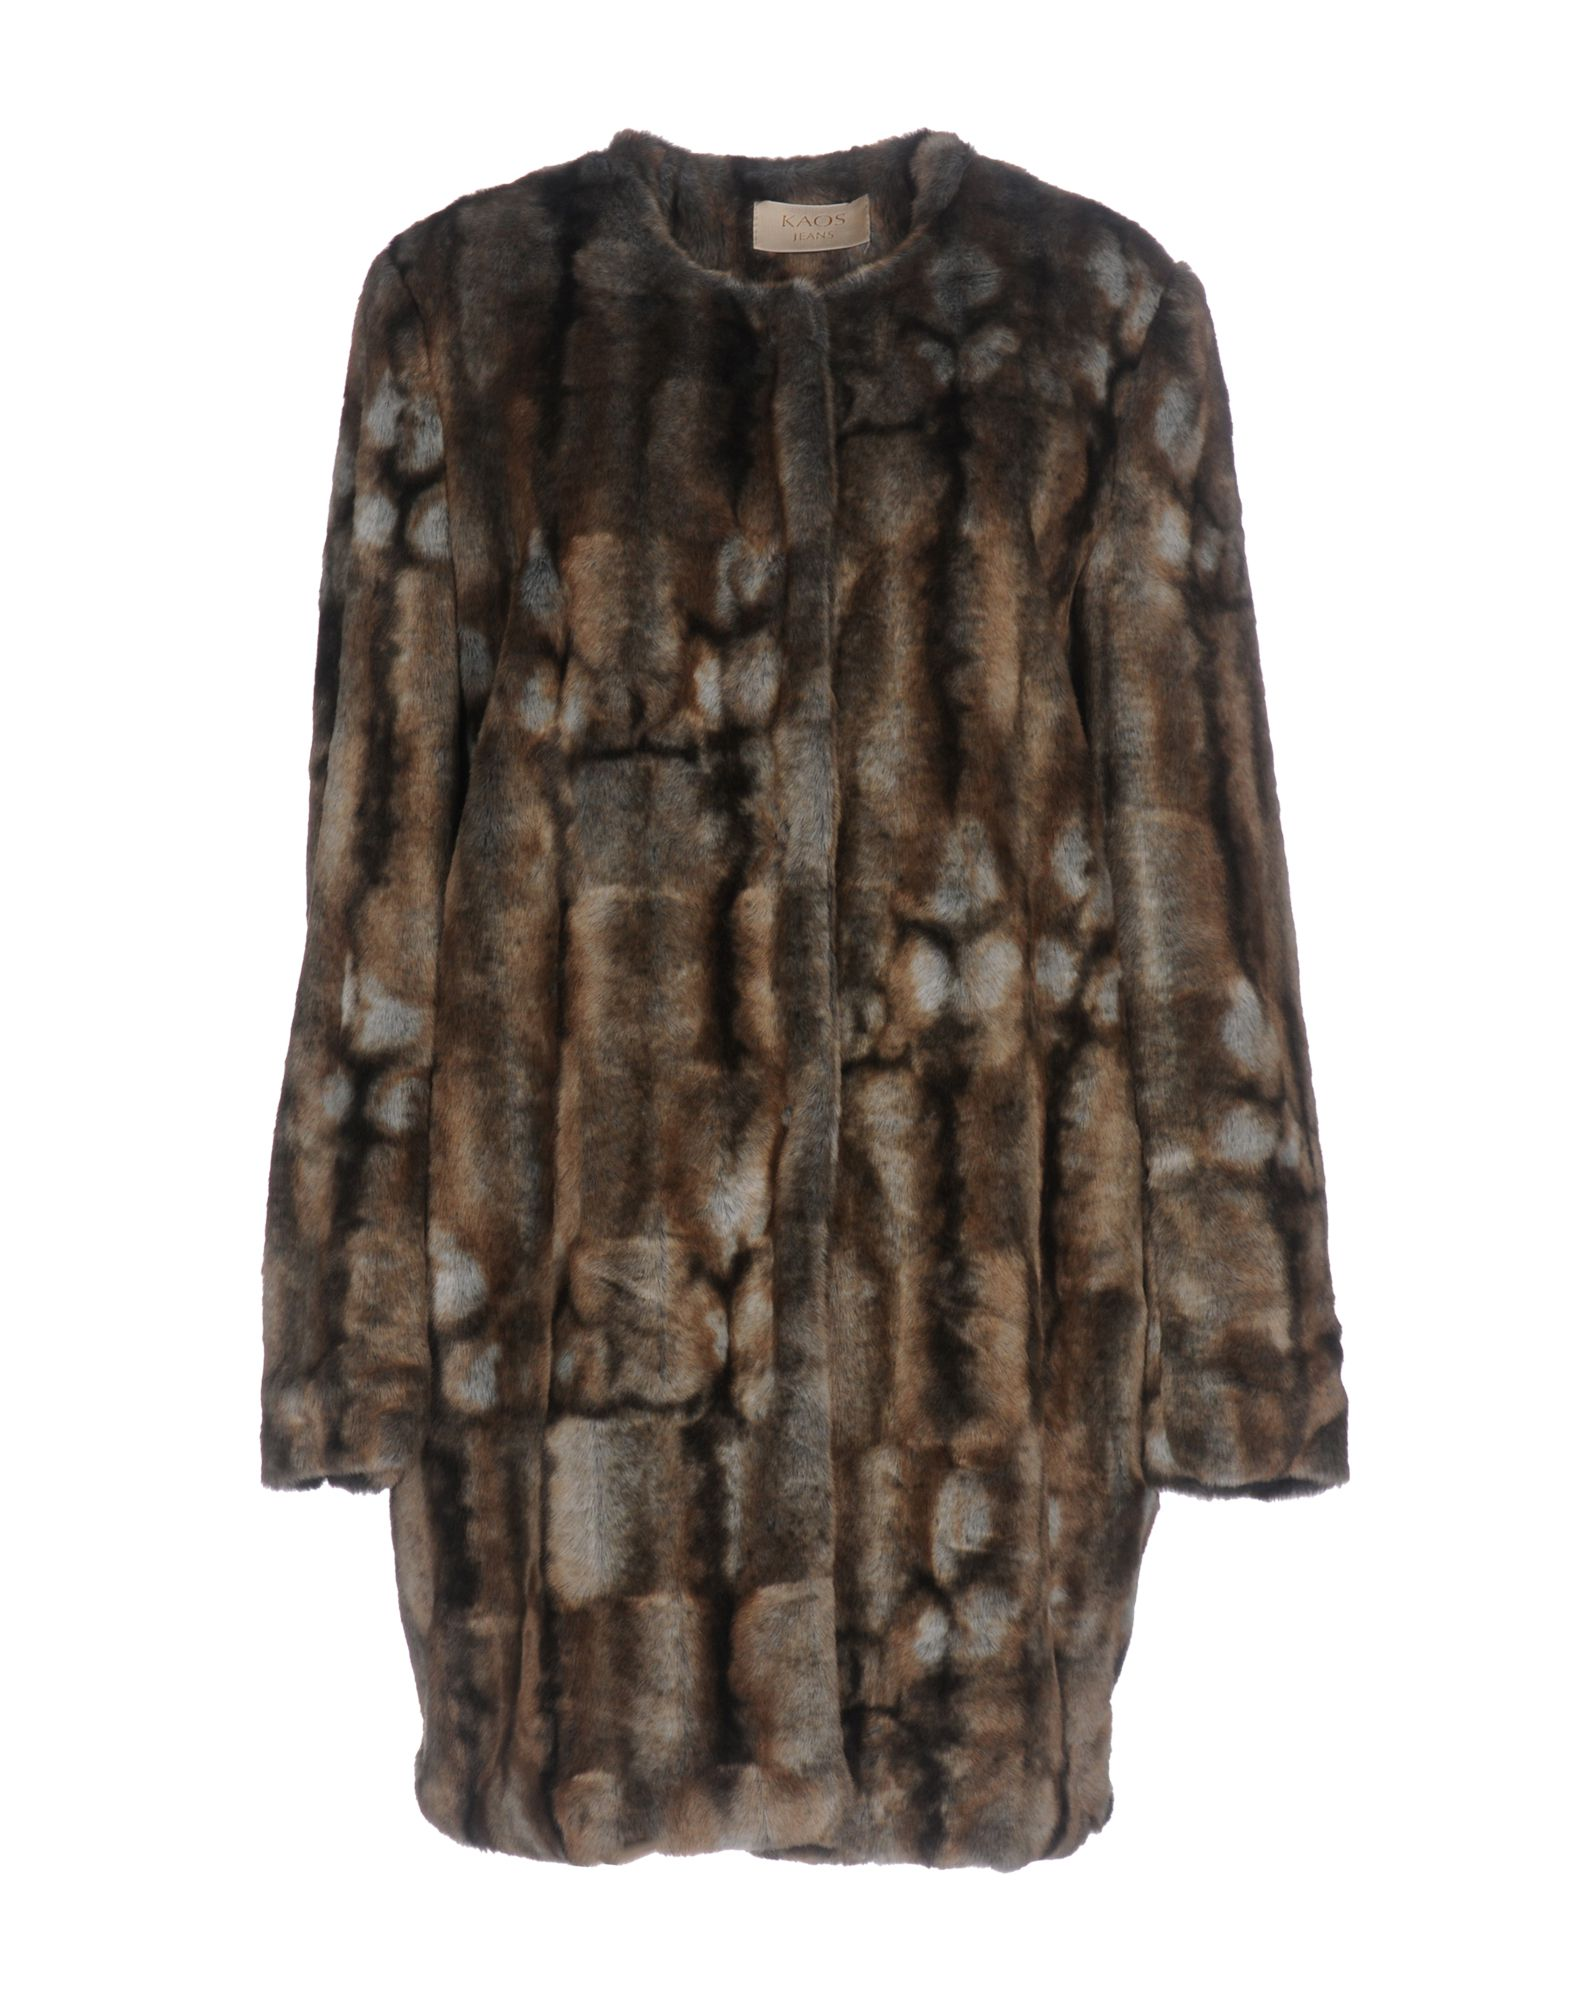 Pelliccia Ecologica Kaos Jeans Donna - Acquista online su 7BE7V